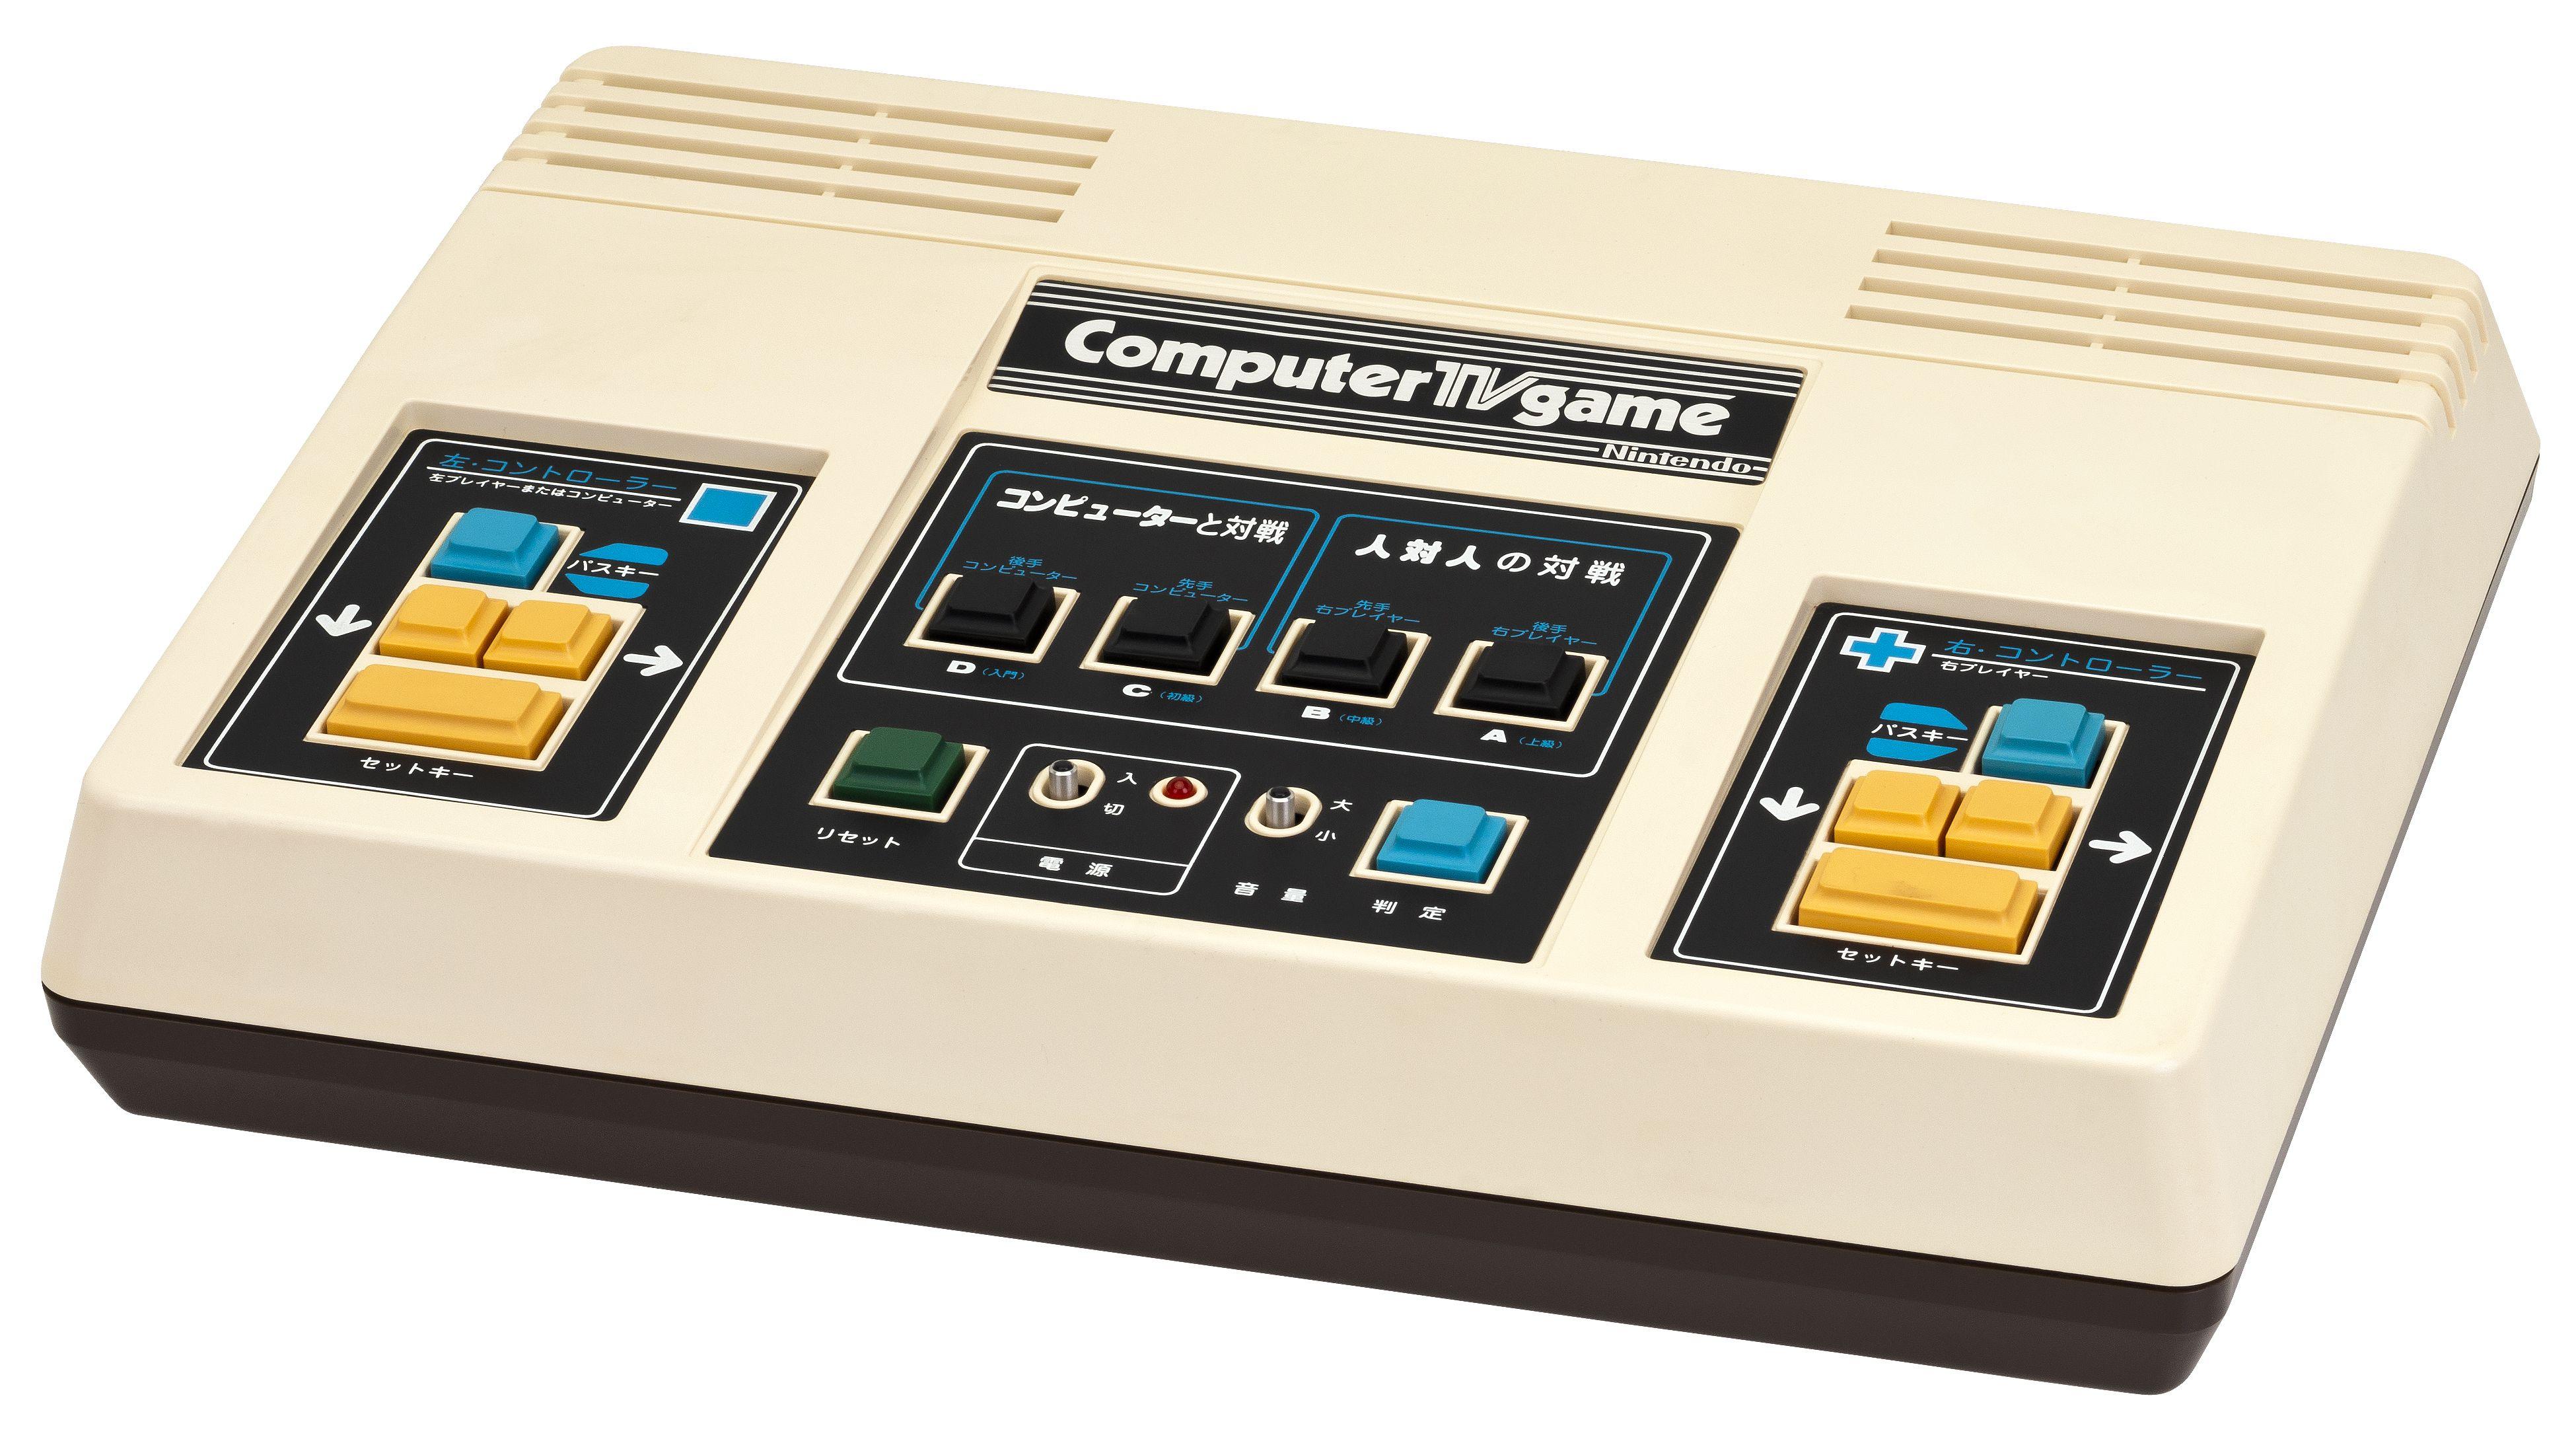 Computer TV game